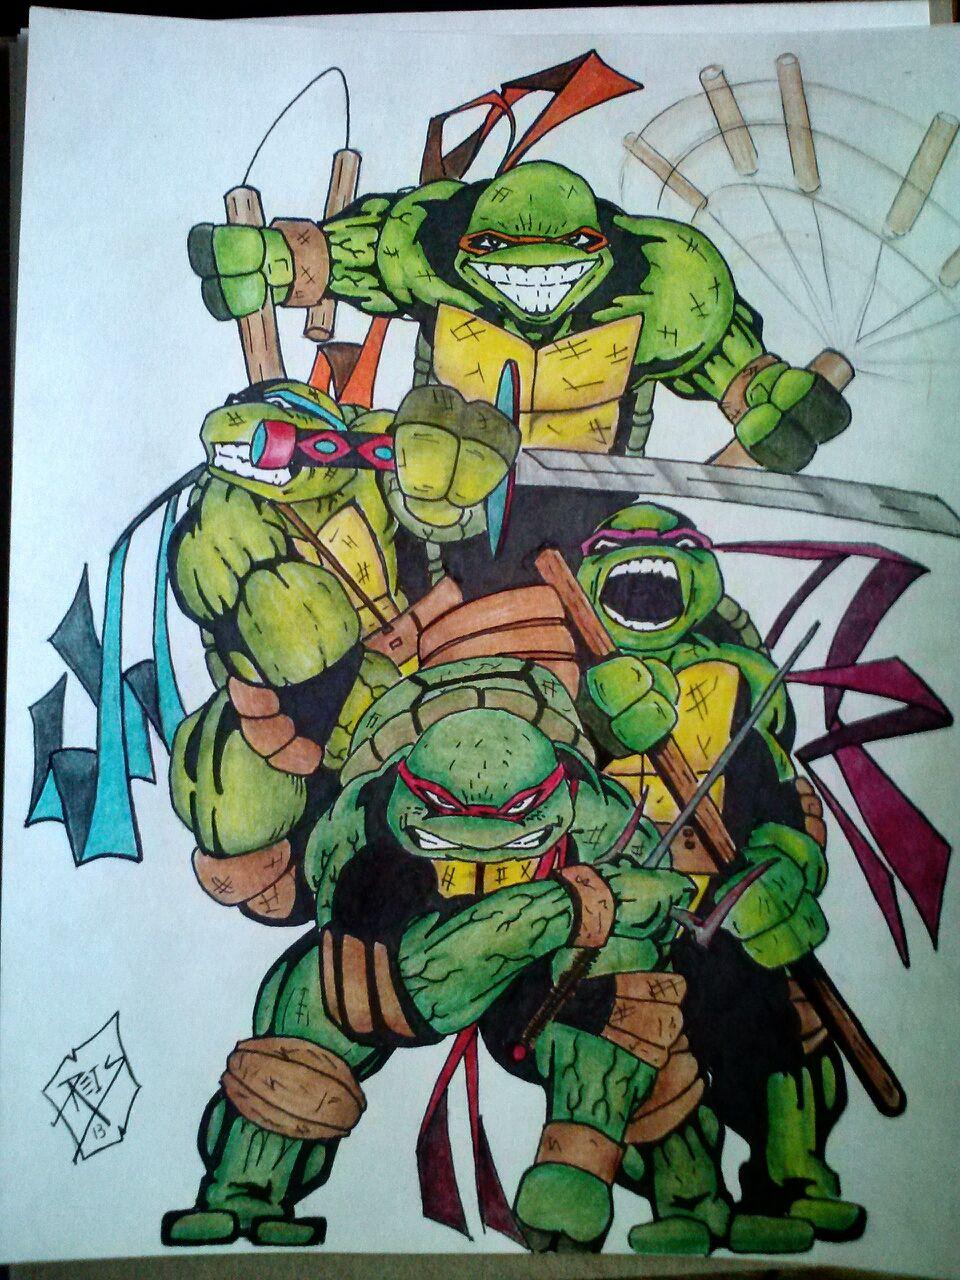 This Teenage Mutant Ninja Turtles Fan Art Comes From Superherouniverse Http Superherouniverse Com Art Showph Cartoon Turtle Teenage Mutant Ninja Turtles Tmnt